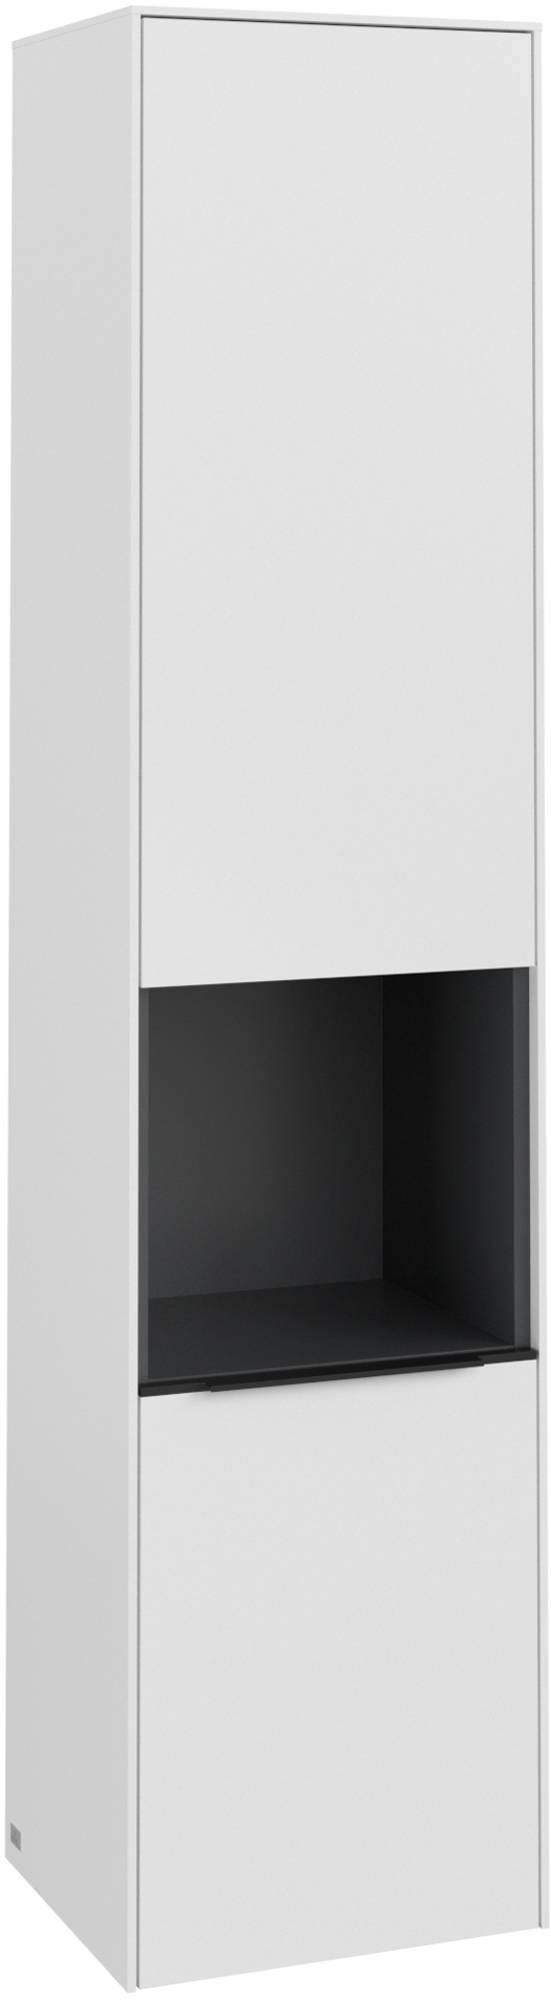 Villeroy & Boch Subway 3.0 Hoge kast 40x36,2x171 cm Pure White